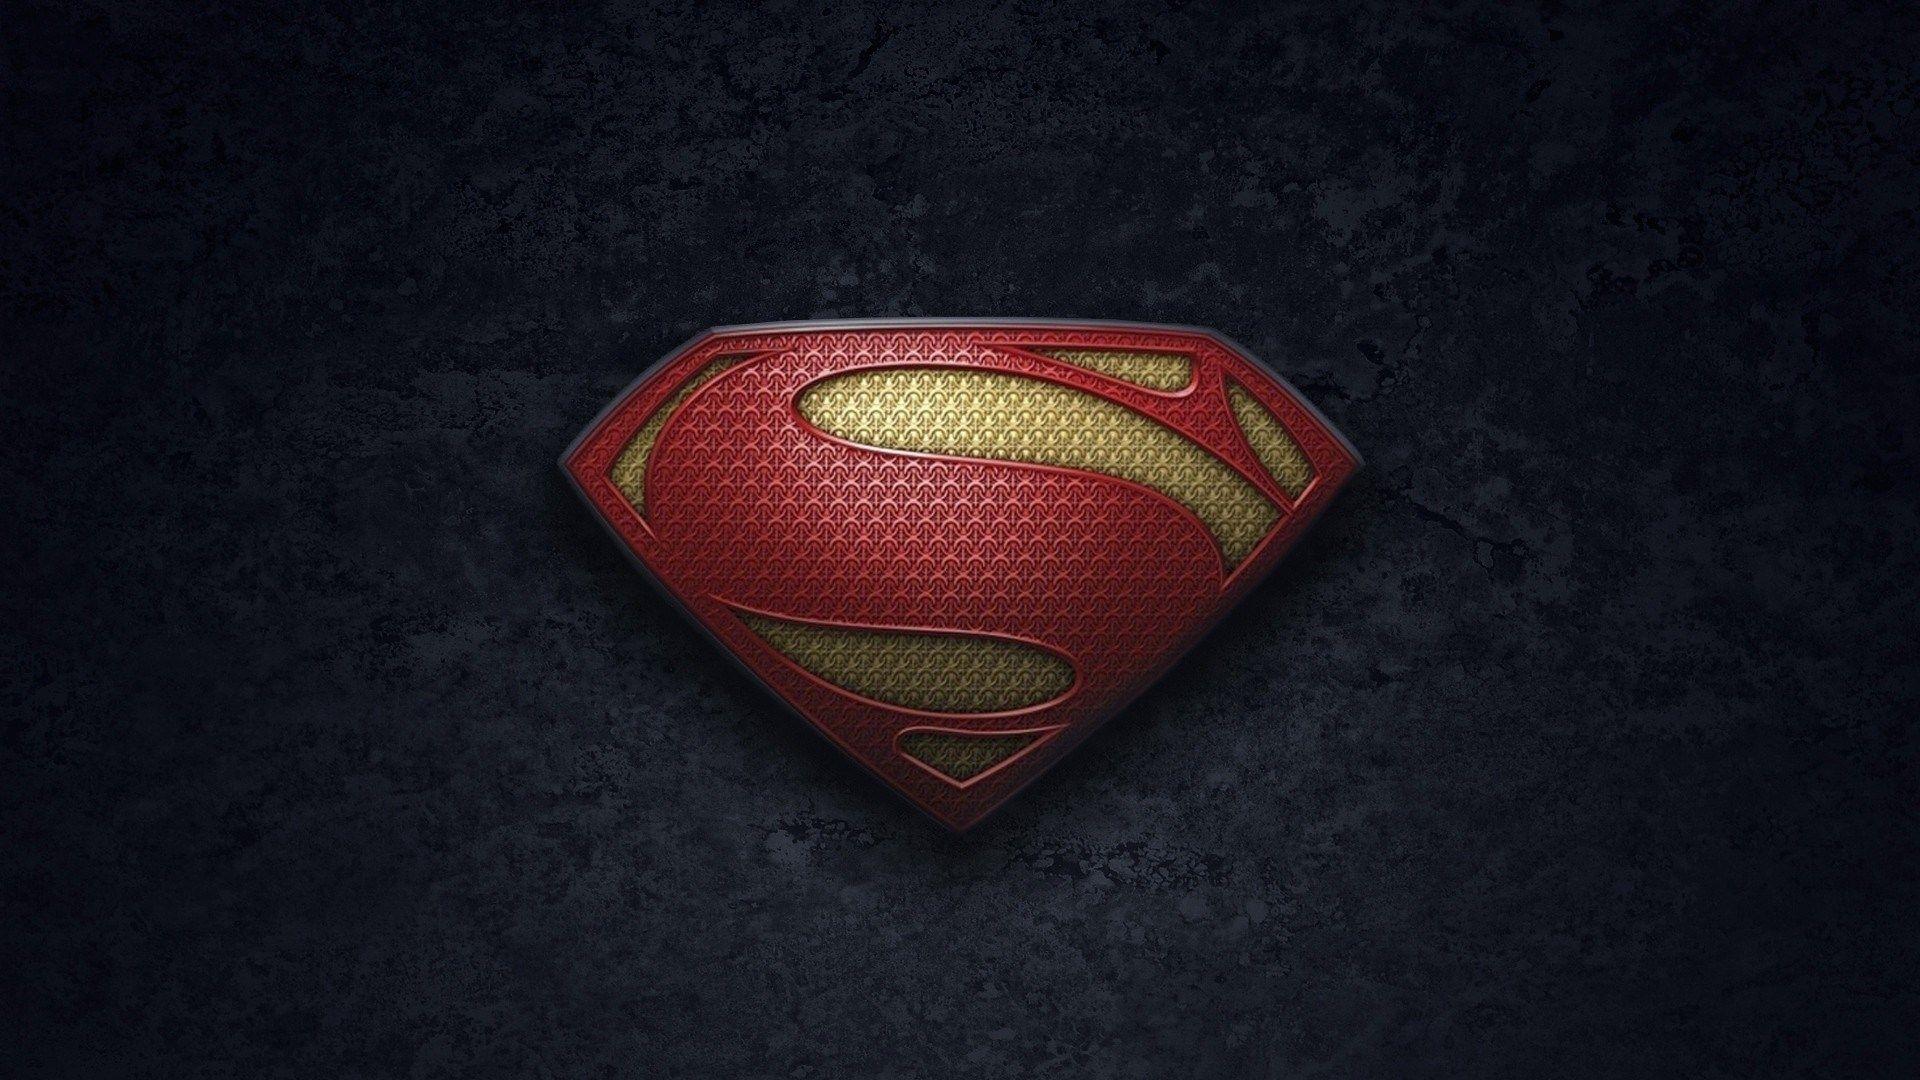 art superman man of steel logo hd wallpaper | cool wallpapers